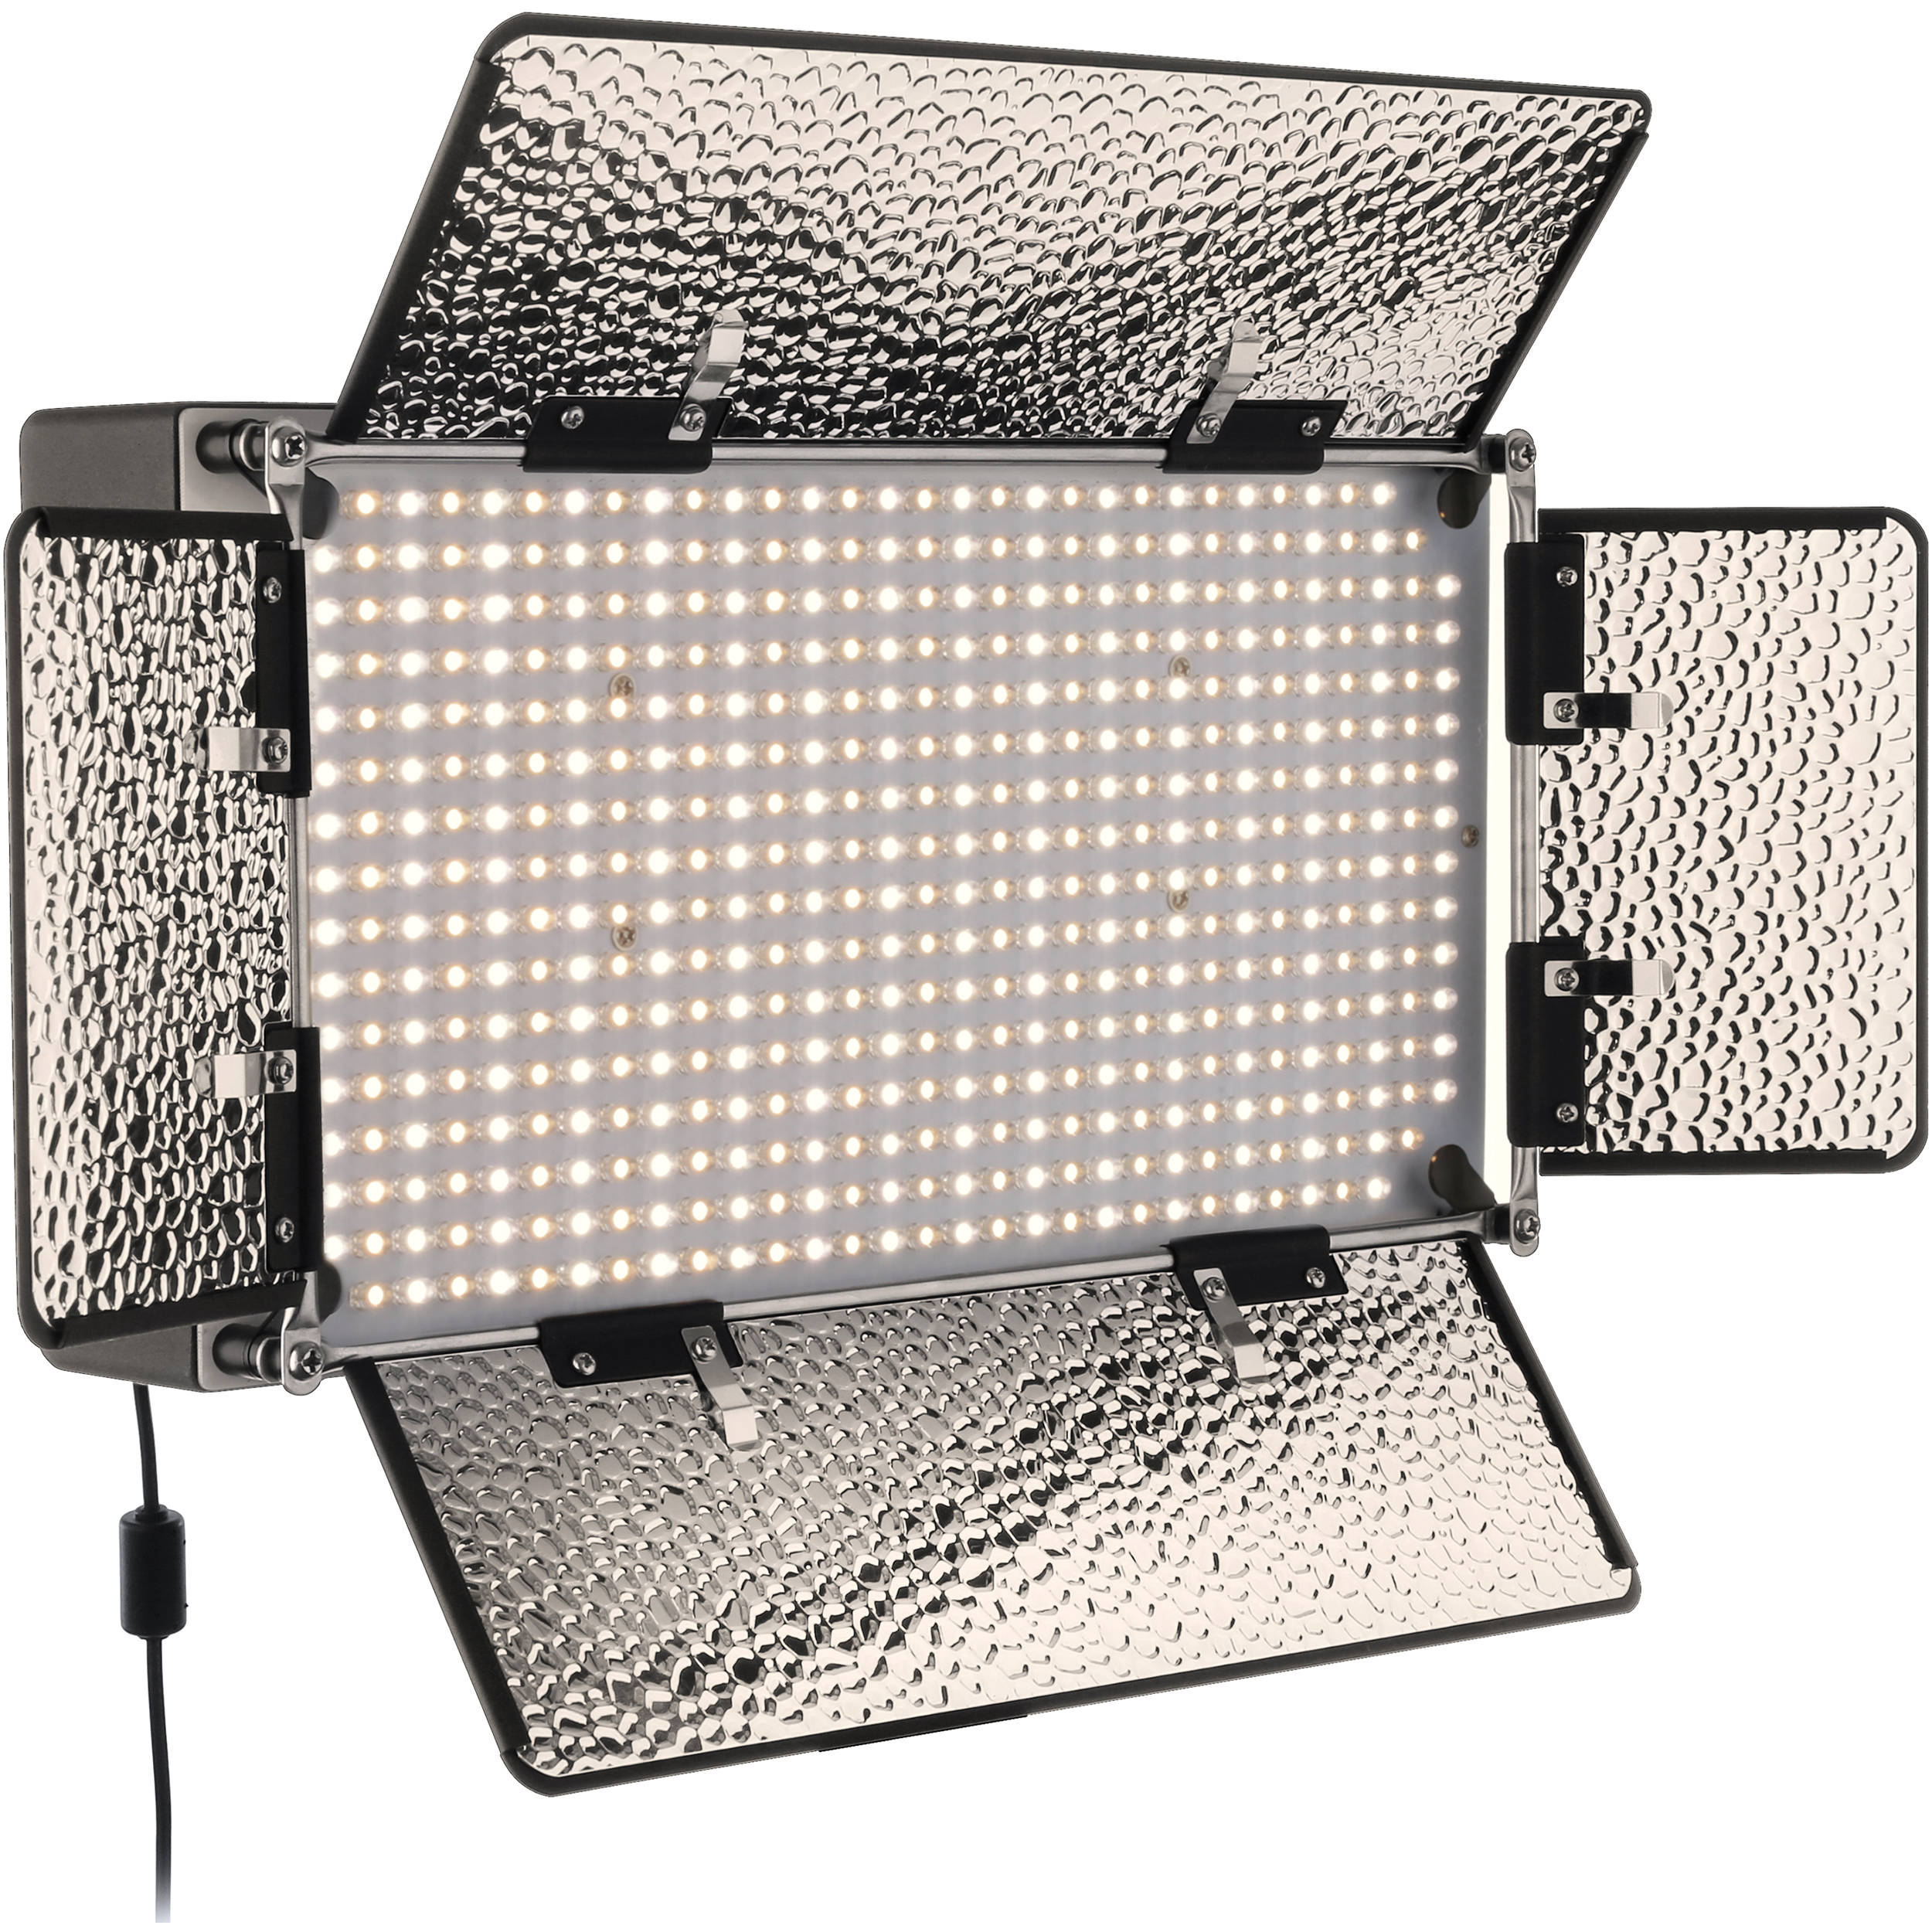 Genaray spectroled studio 500 bi color led light sp s 500b bh genaray spectroled studio 500 bi color led light arubaitofo Images